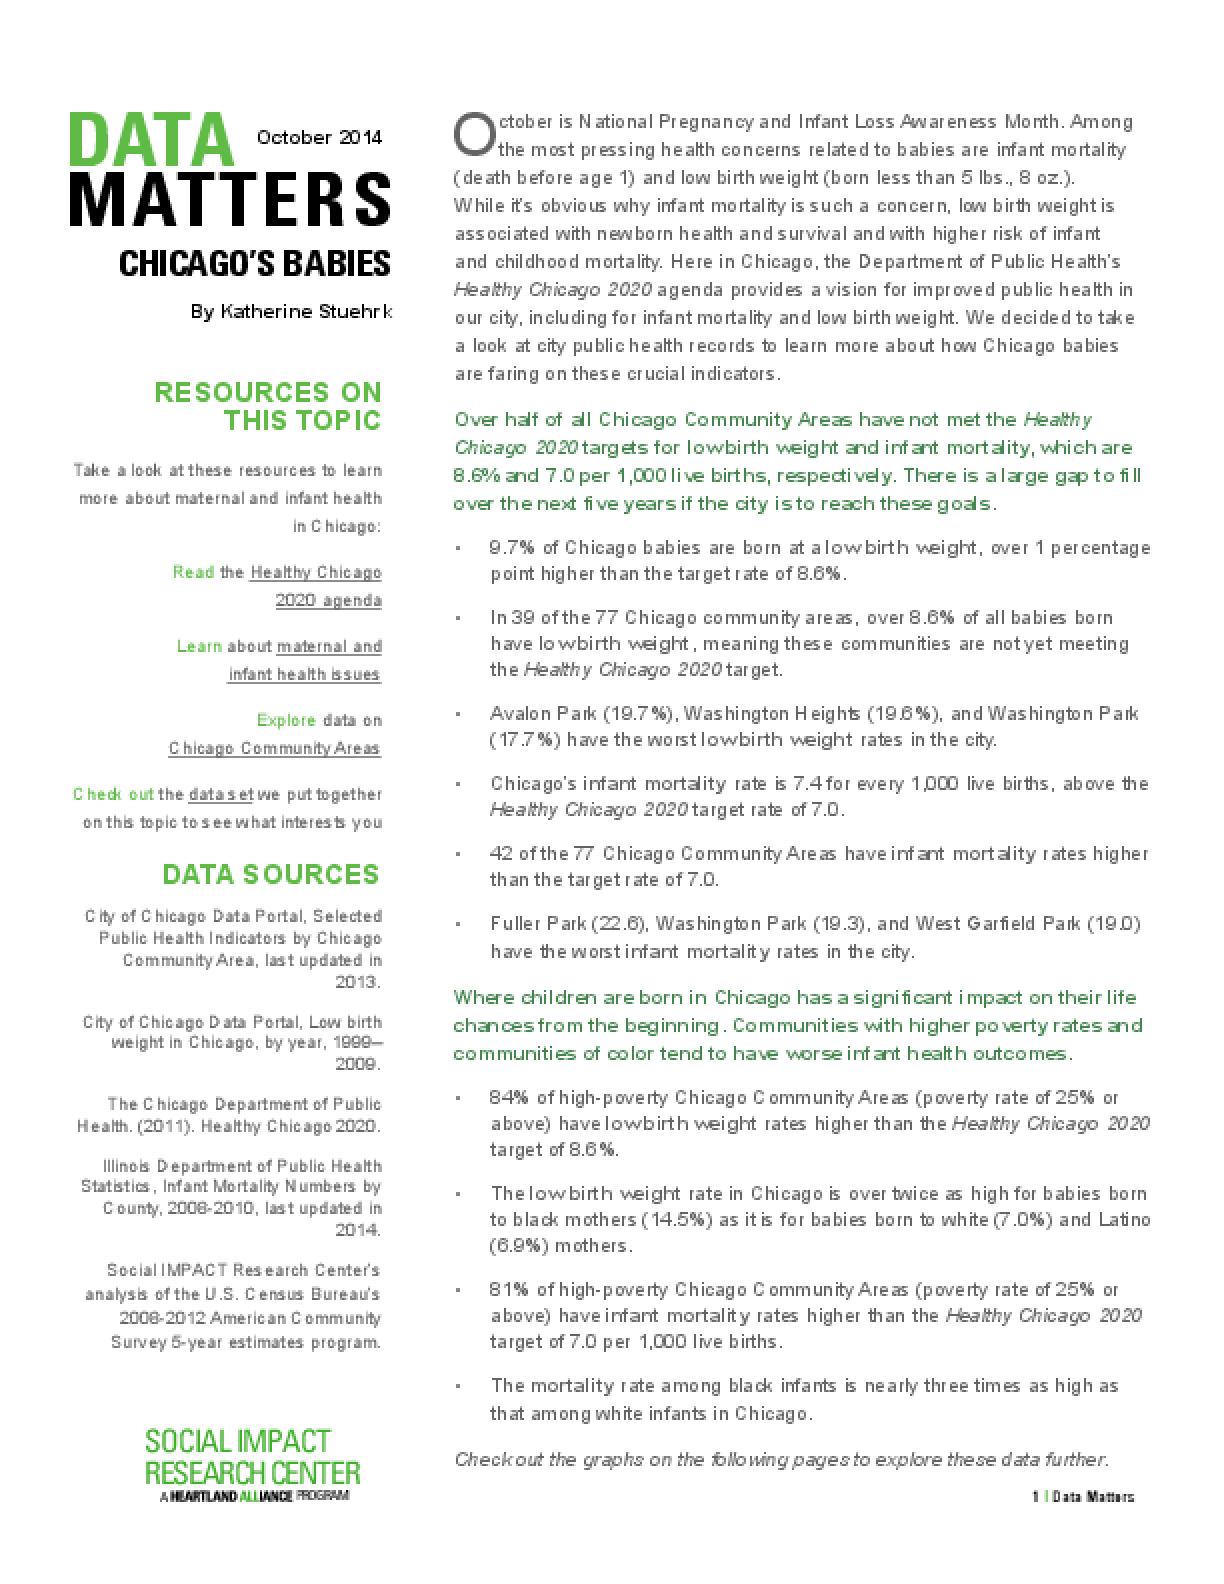 Data Matters: Chicago's Babies